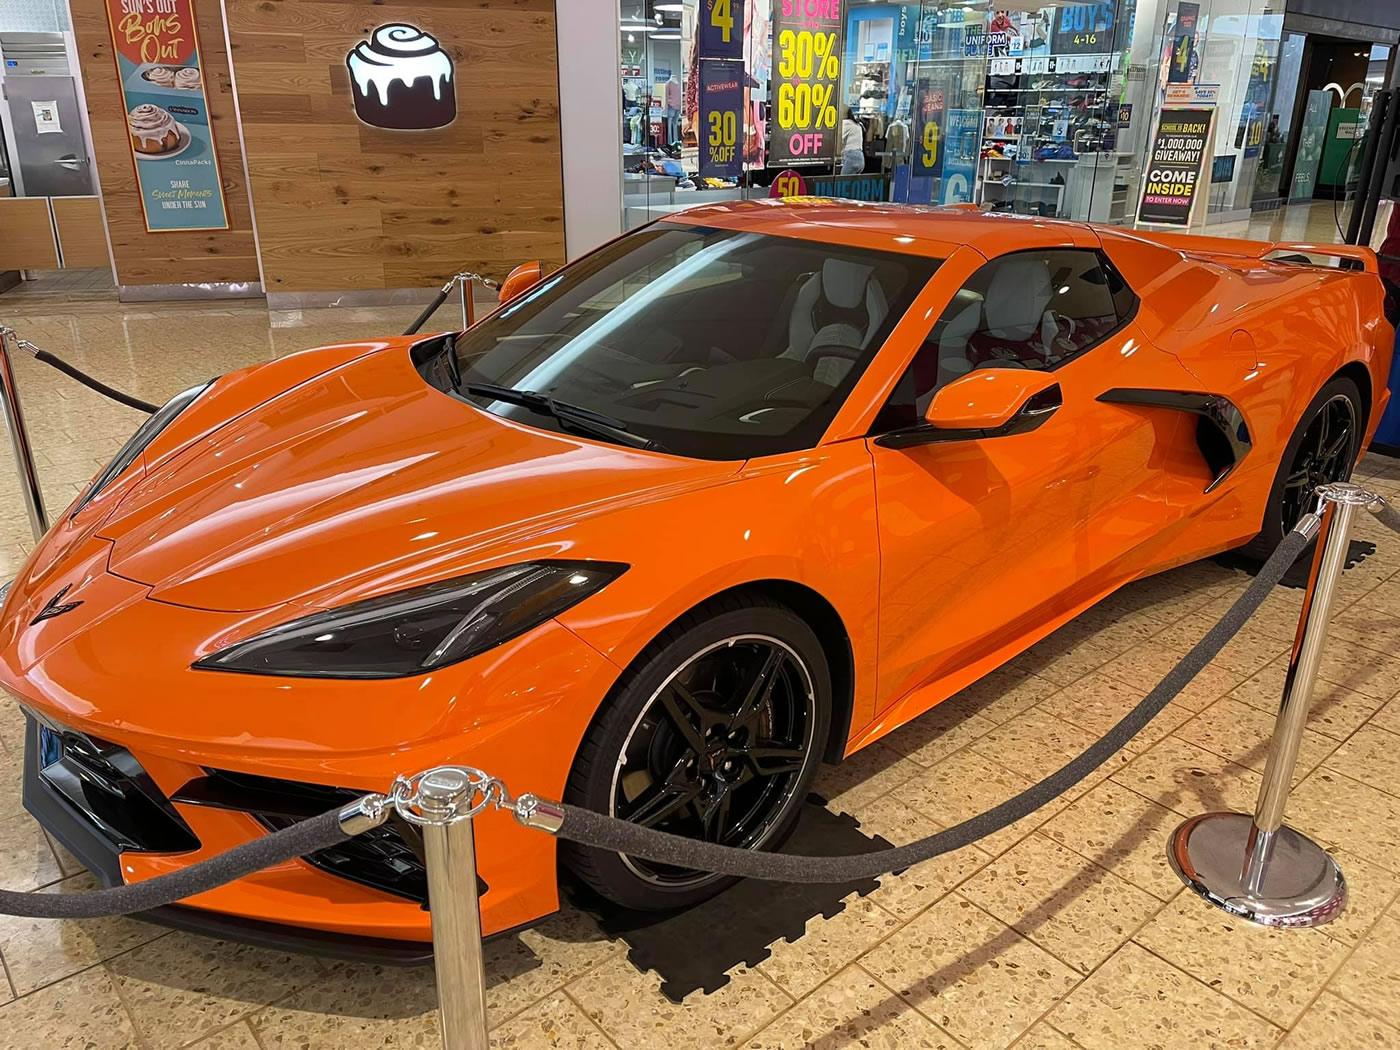 2022-corvette-amplify-orange-1.jpg